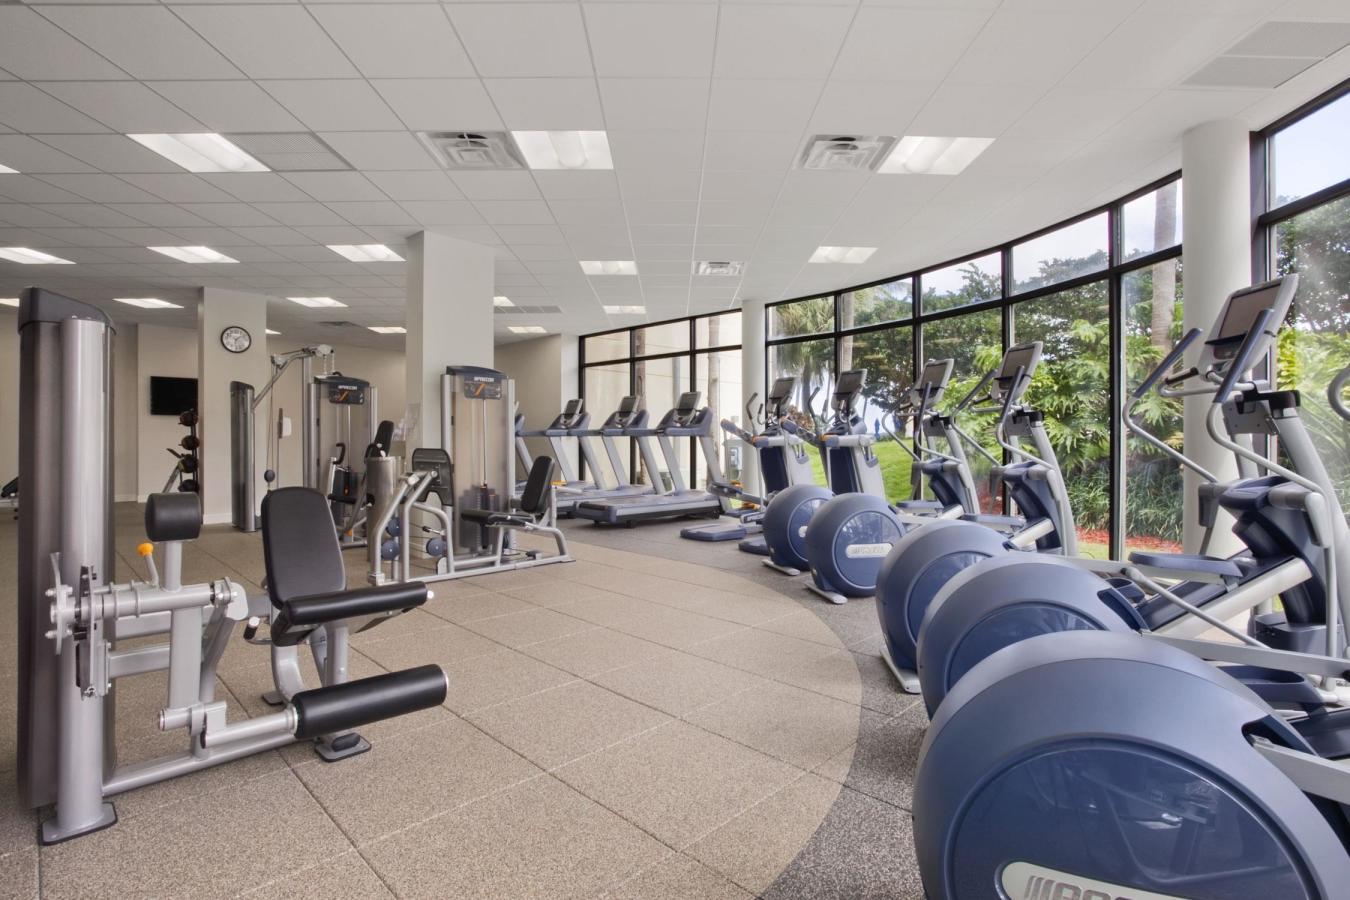 Fitness Center at the Hilton Miami Airport Blue Lagoon